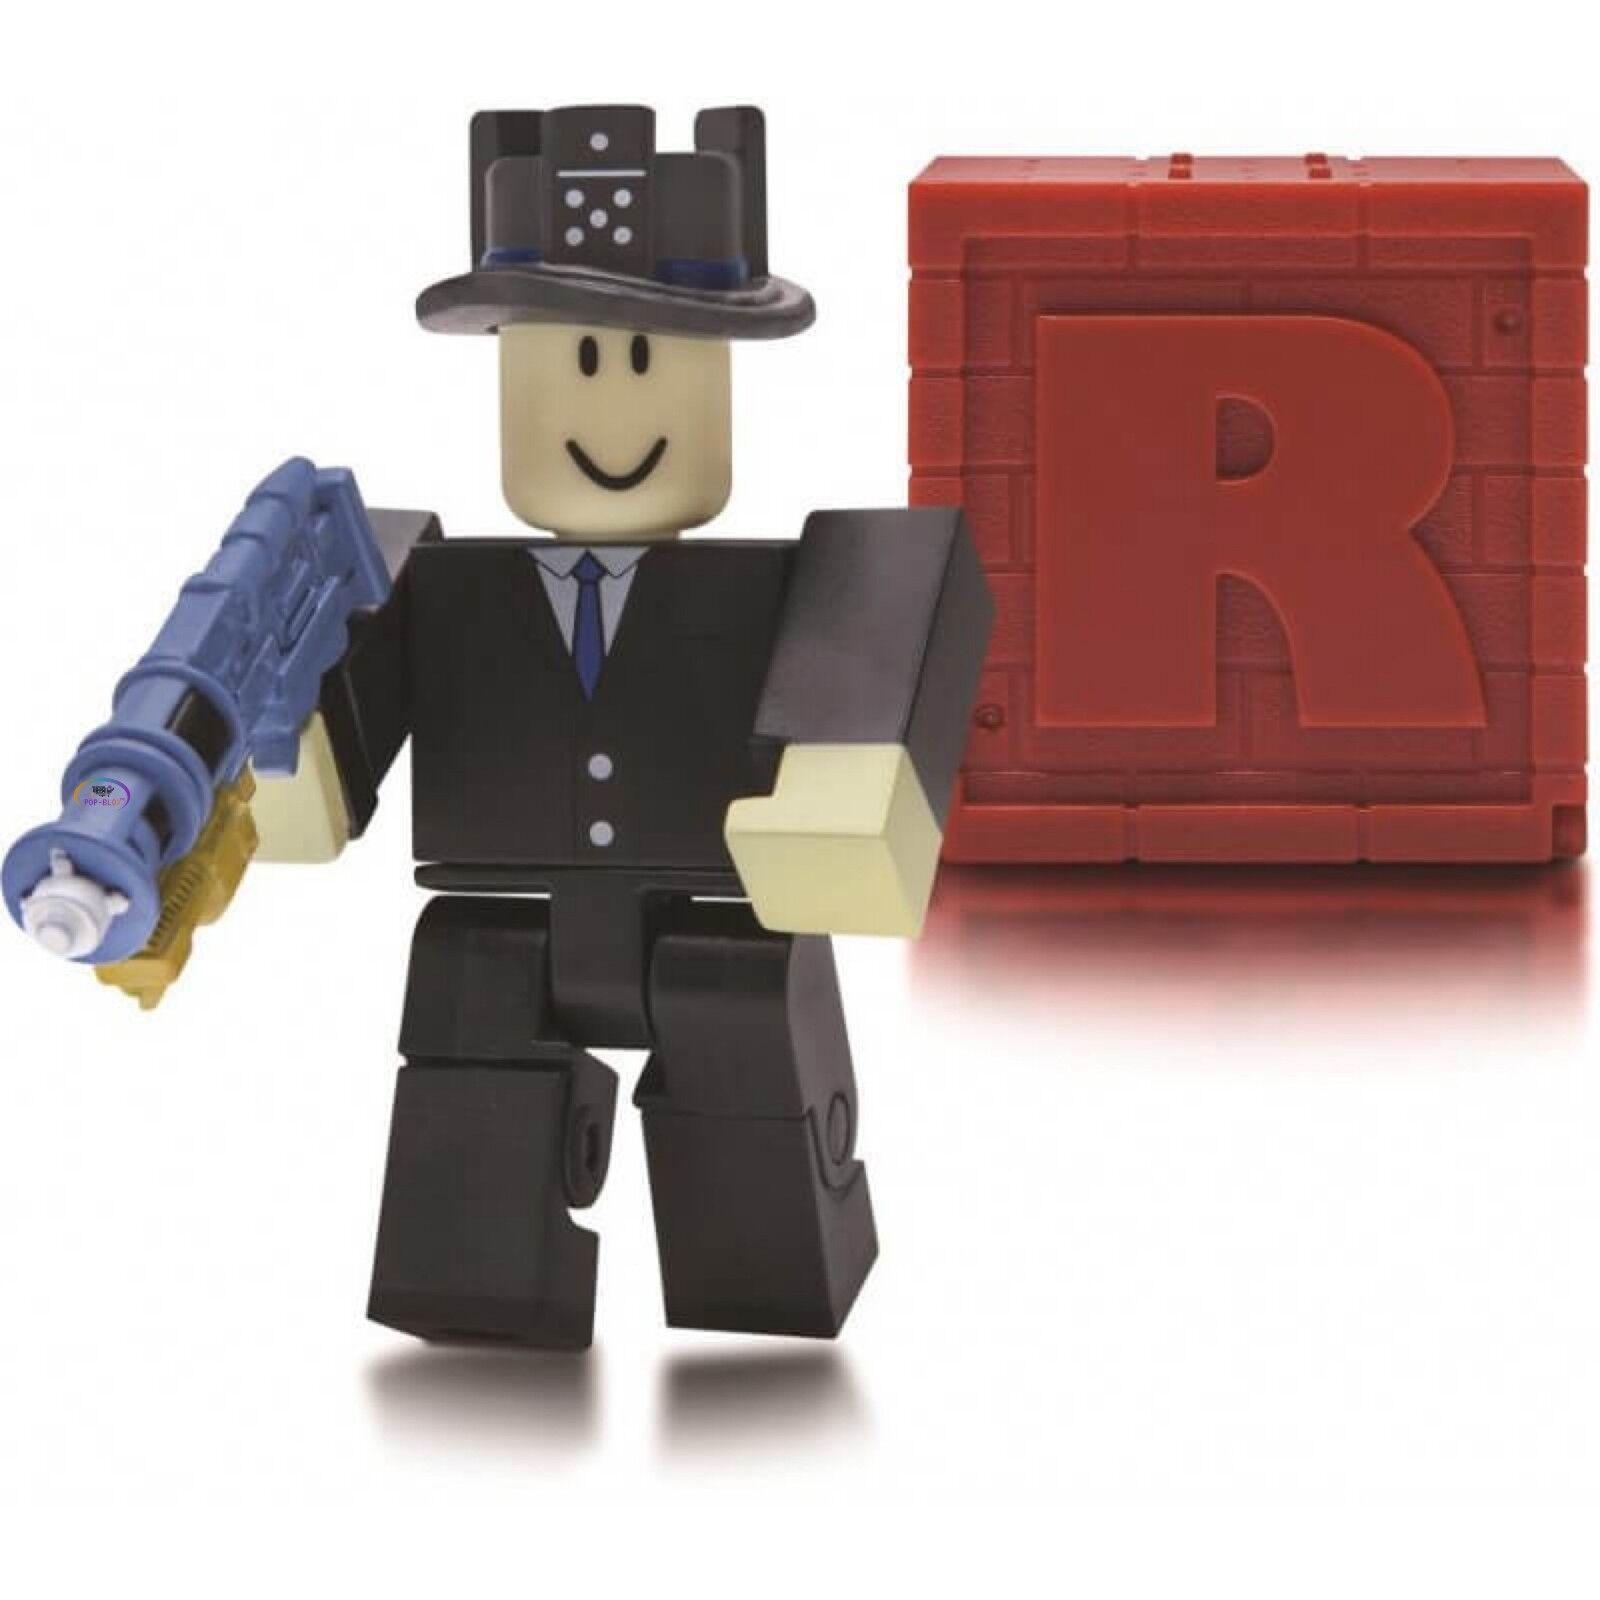 Coeptus Roblox Virtual Code Roblox Toys Series 3